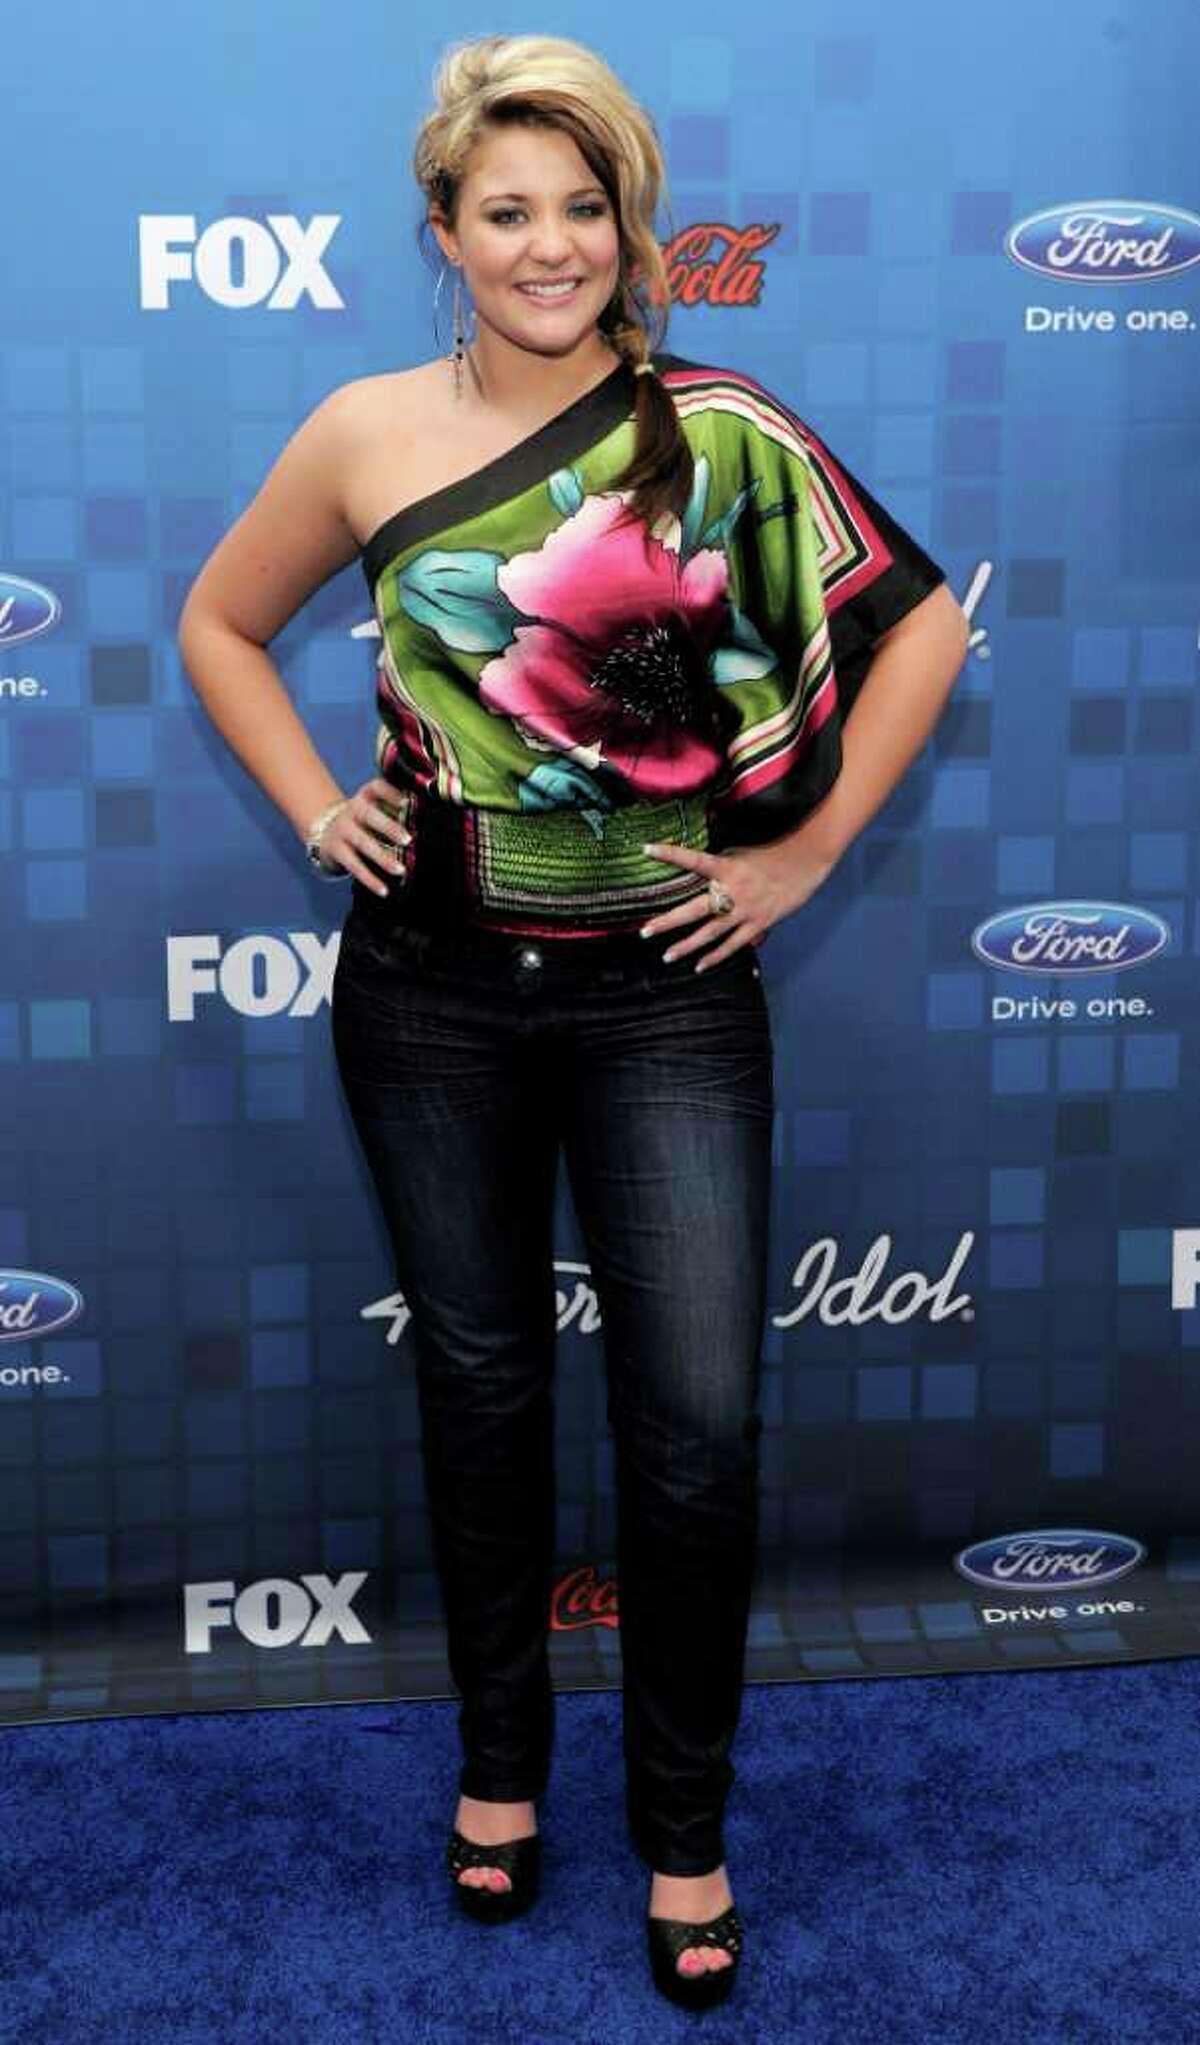 """American Idol"" finalist Lauren Alaina poses at the ""American Idol"" Finalists Party in Los Angeles, Thursday, March 3, 2011."